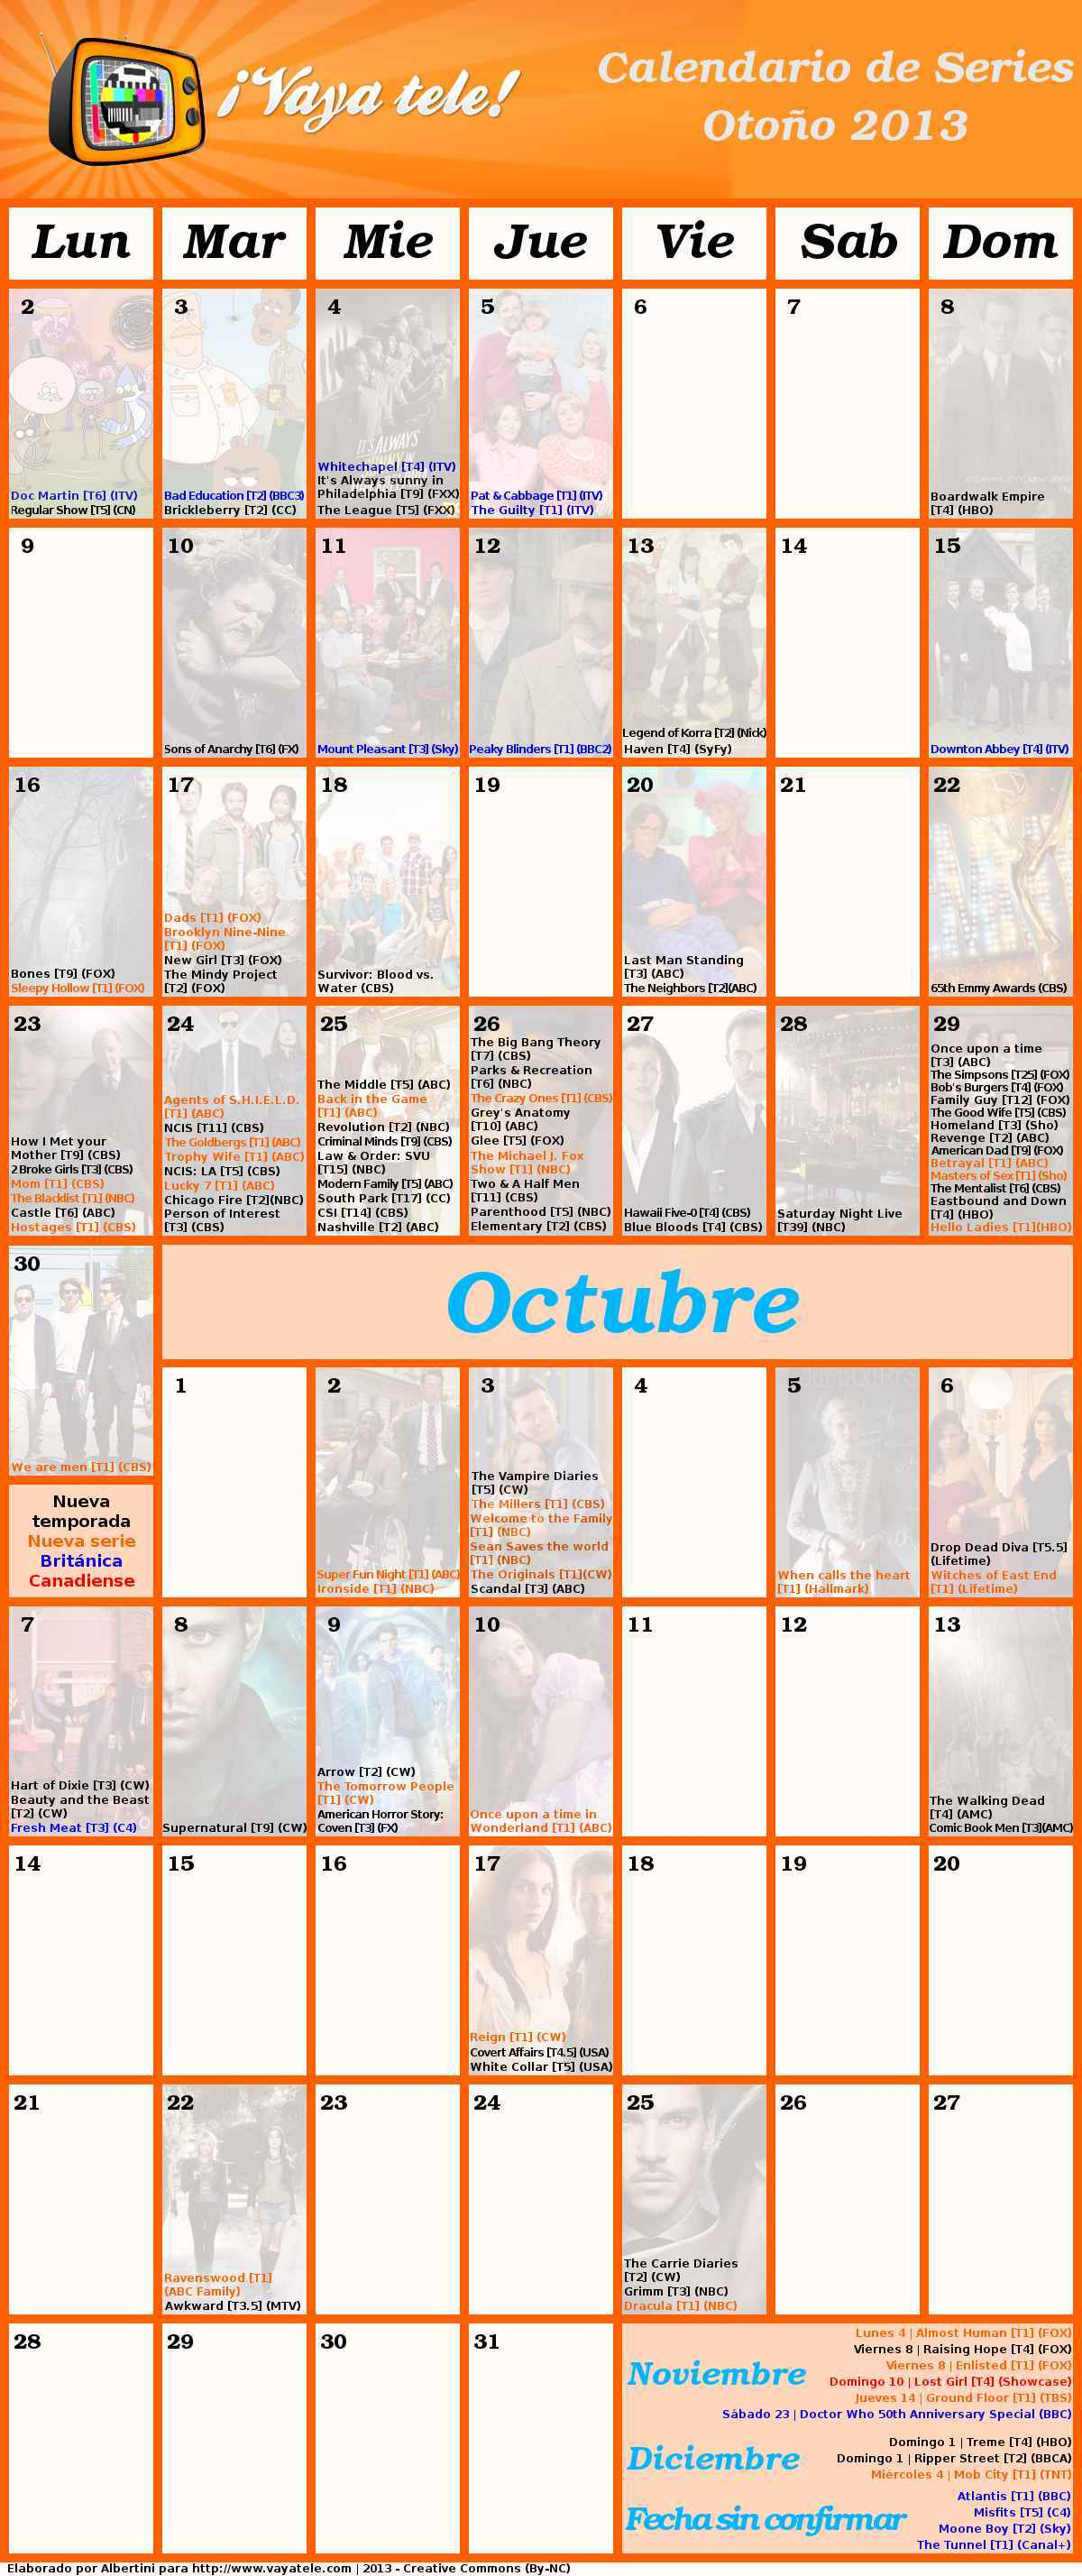 Foto de Calendario Otoño 2013 (2/2)